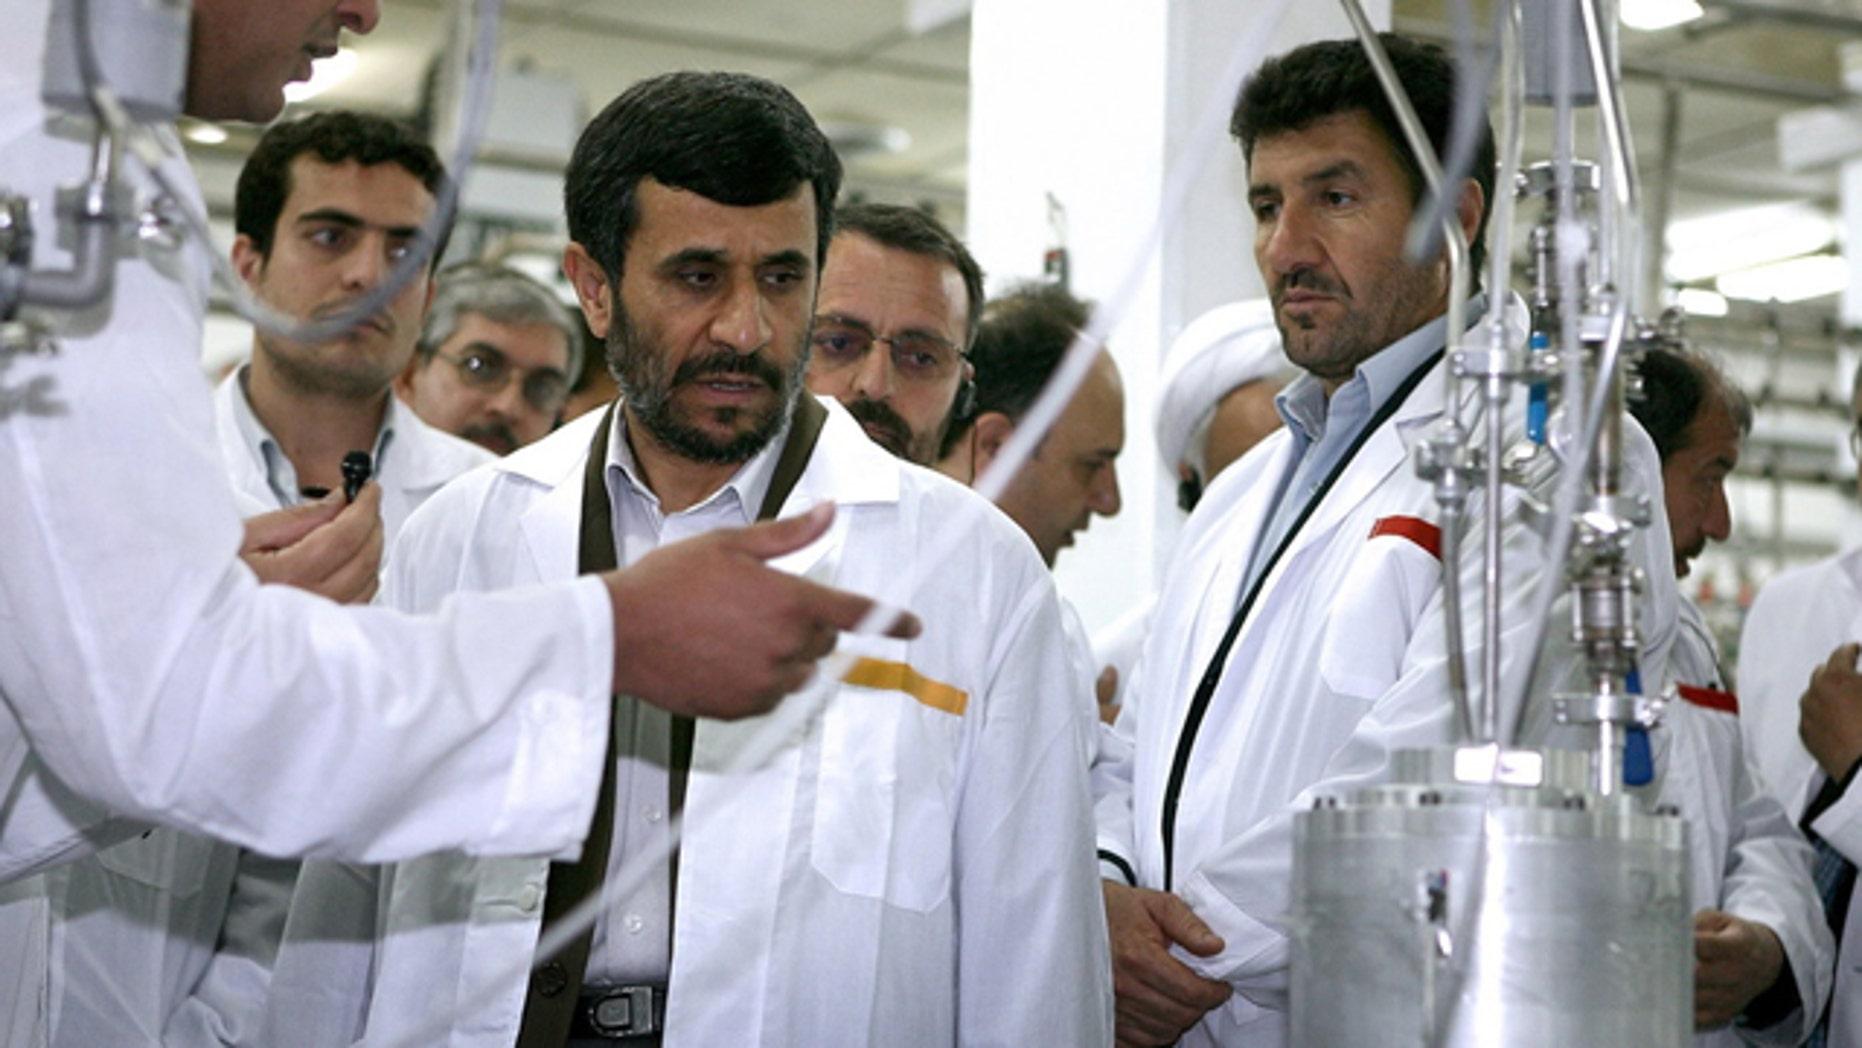 FILE: April 2008: President Mahmoud Ahmadinejad listens to a technician during his visit of the Natanz Uranium Enrichment Facility.